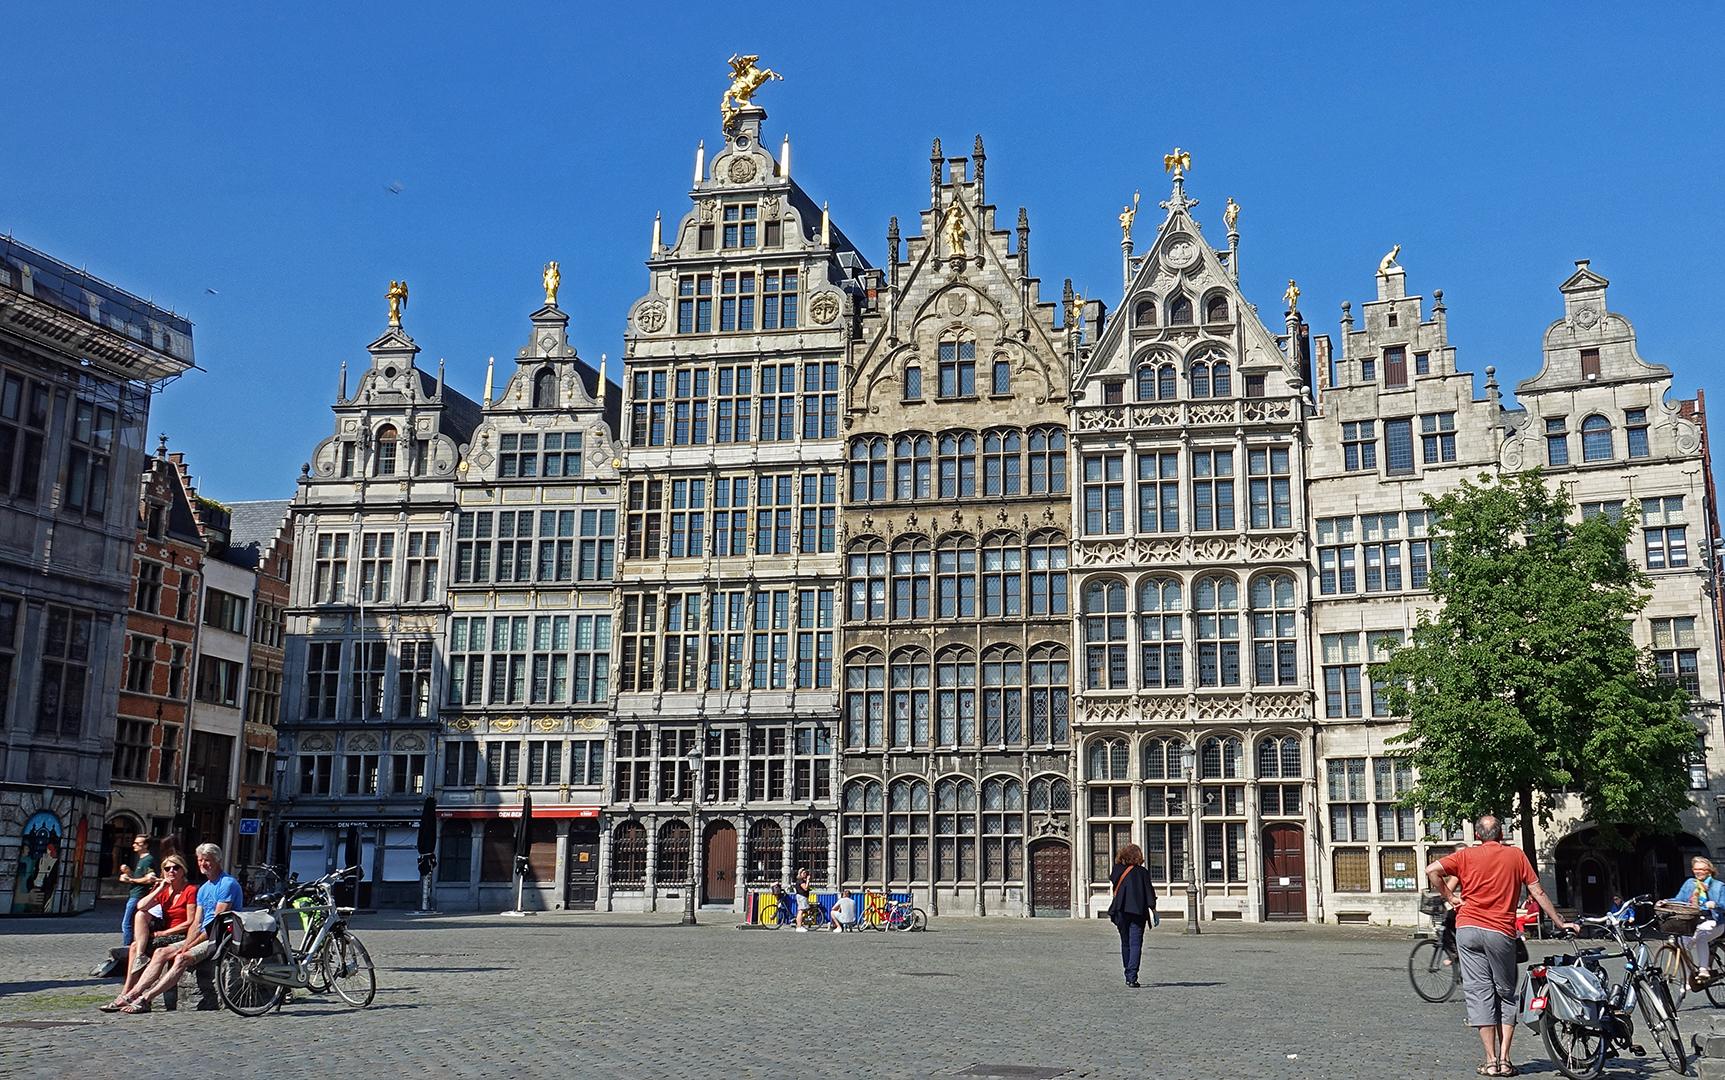 Grote Markt (Great Market Square) - Antwerp (B)